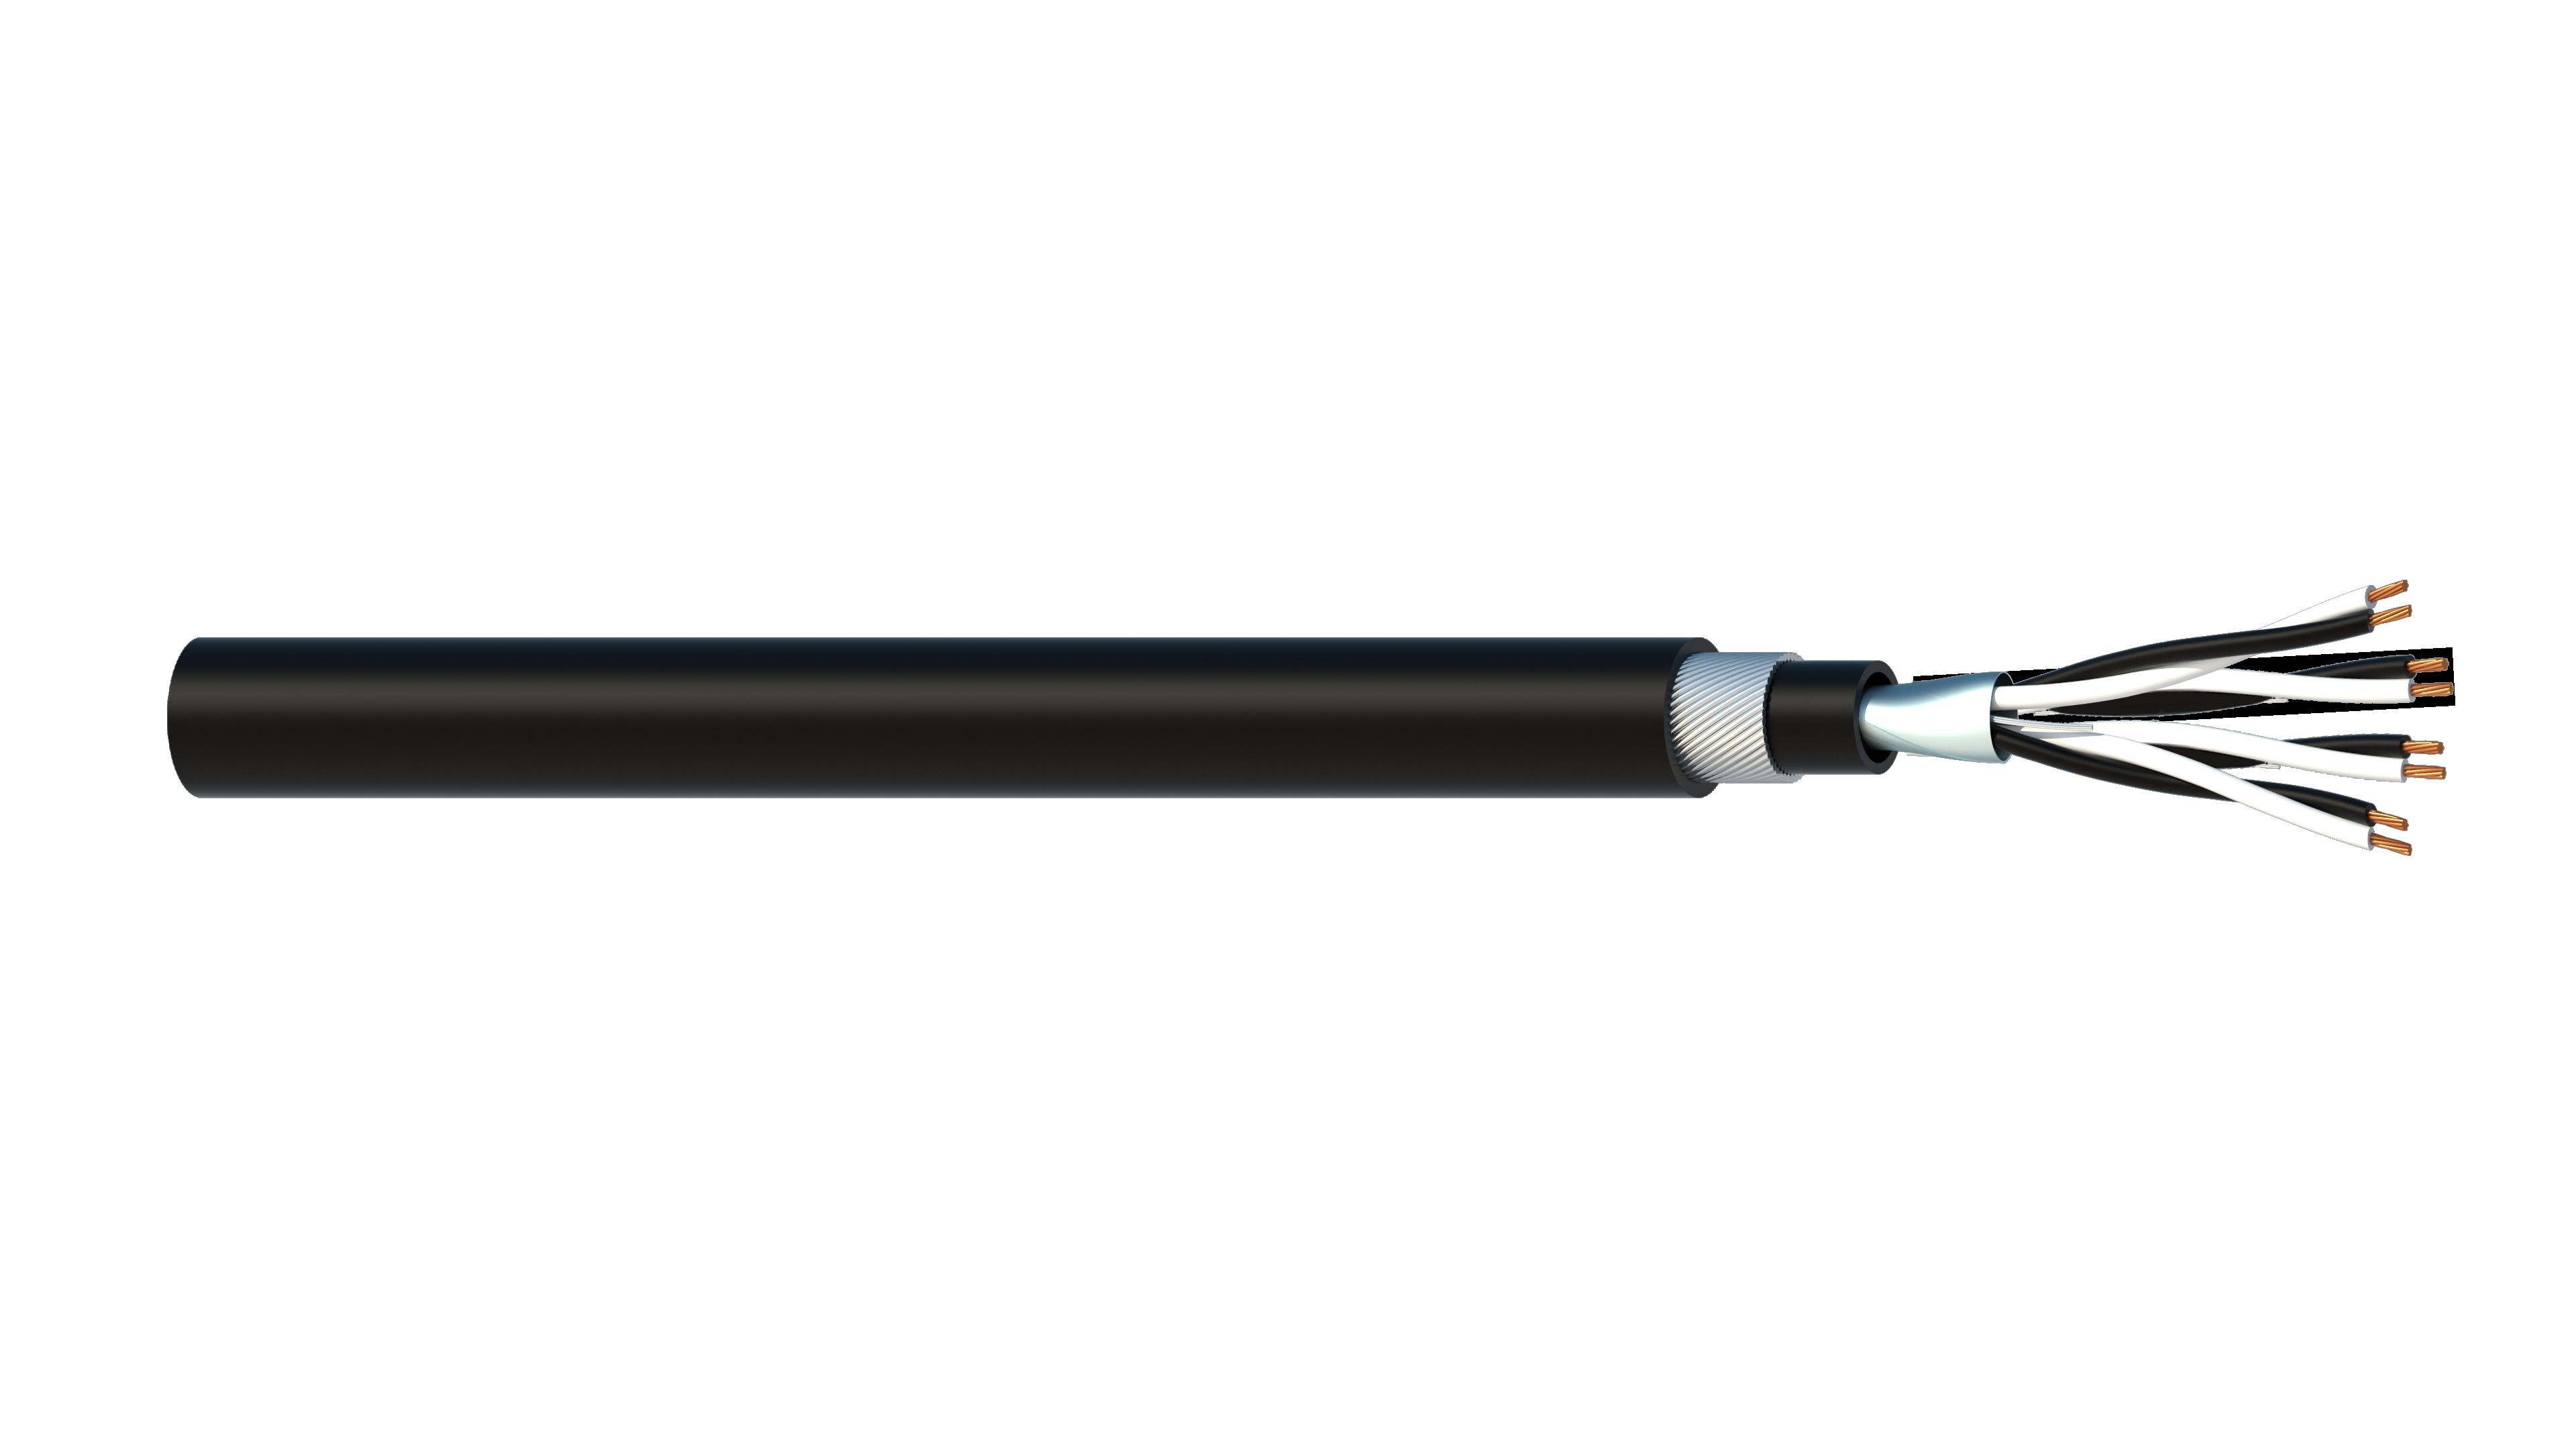 4 Pair 0.5mm2 Cu/PVC/OS/PVC/SWA/PVC Maser Instrumentation Cable - Black Sheath